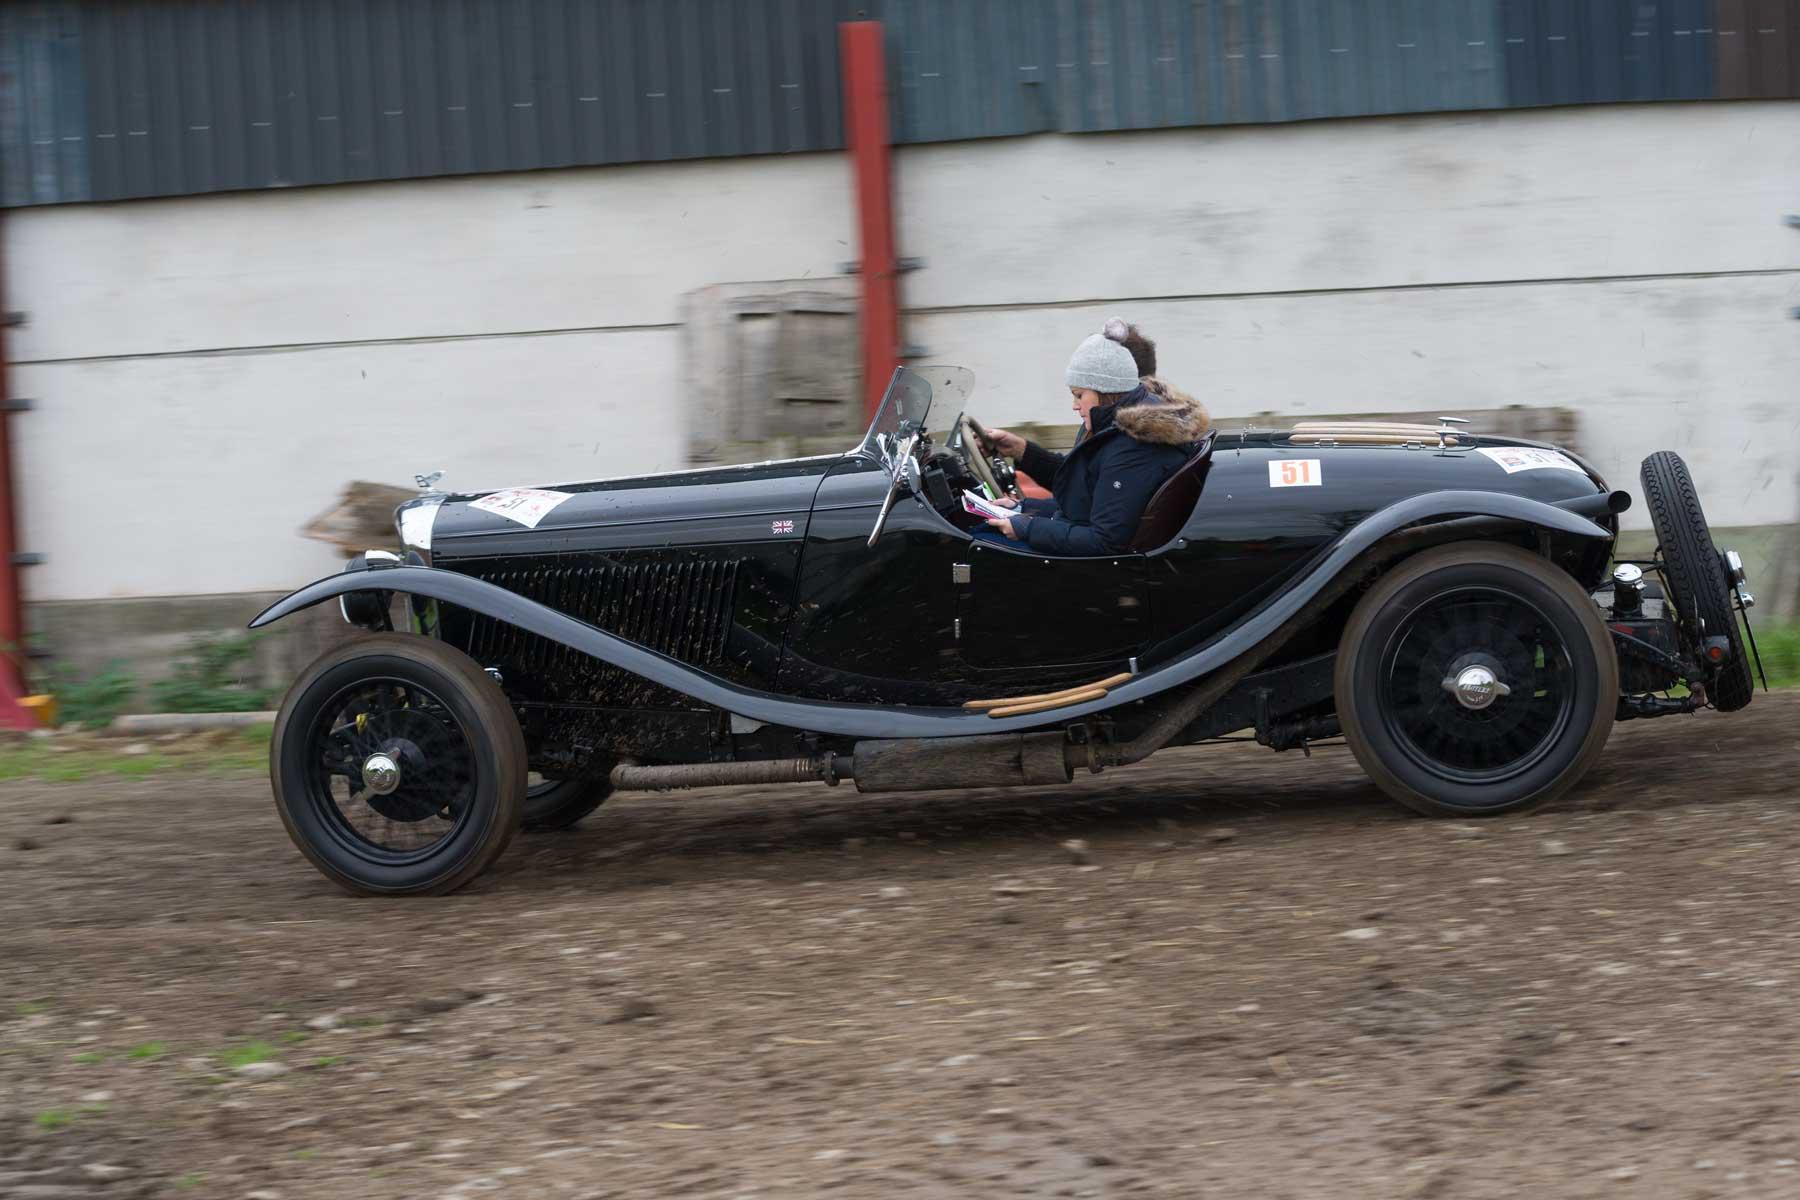 Elliott Dale/Charlotte Ryall, 1937 Bentley Derby